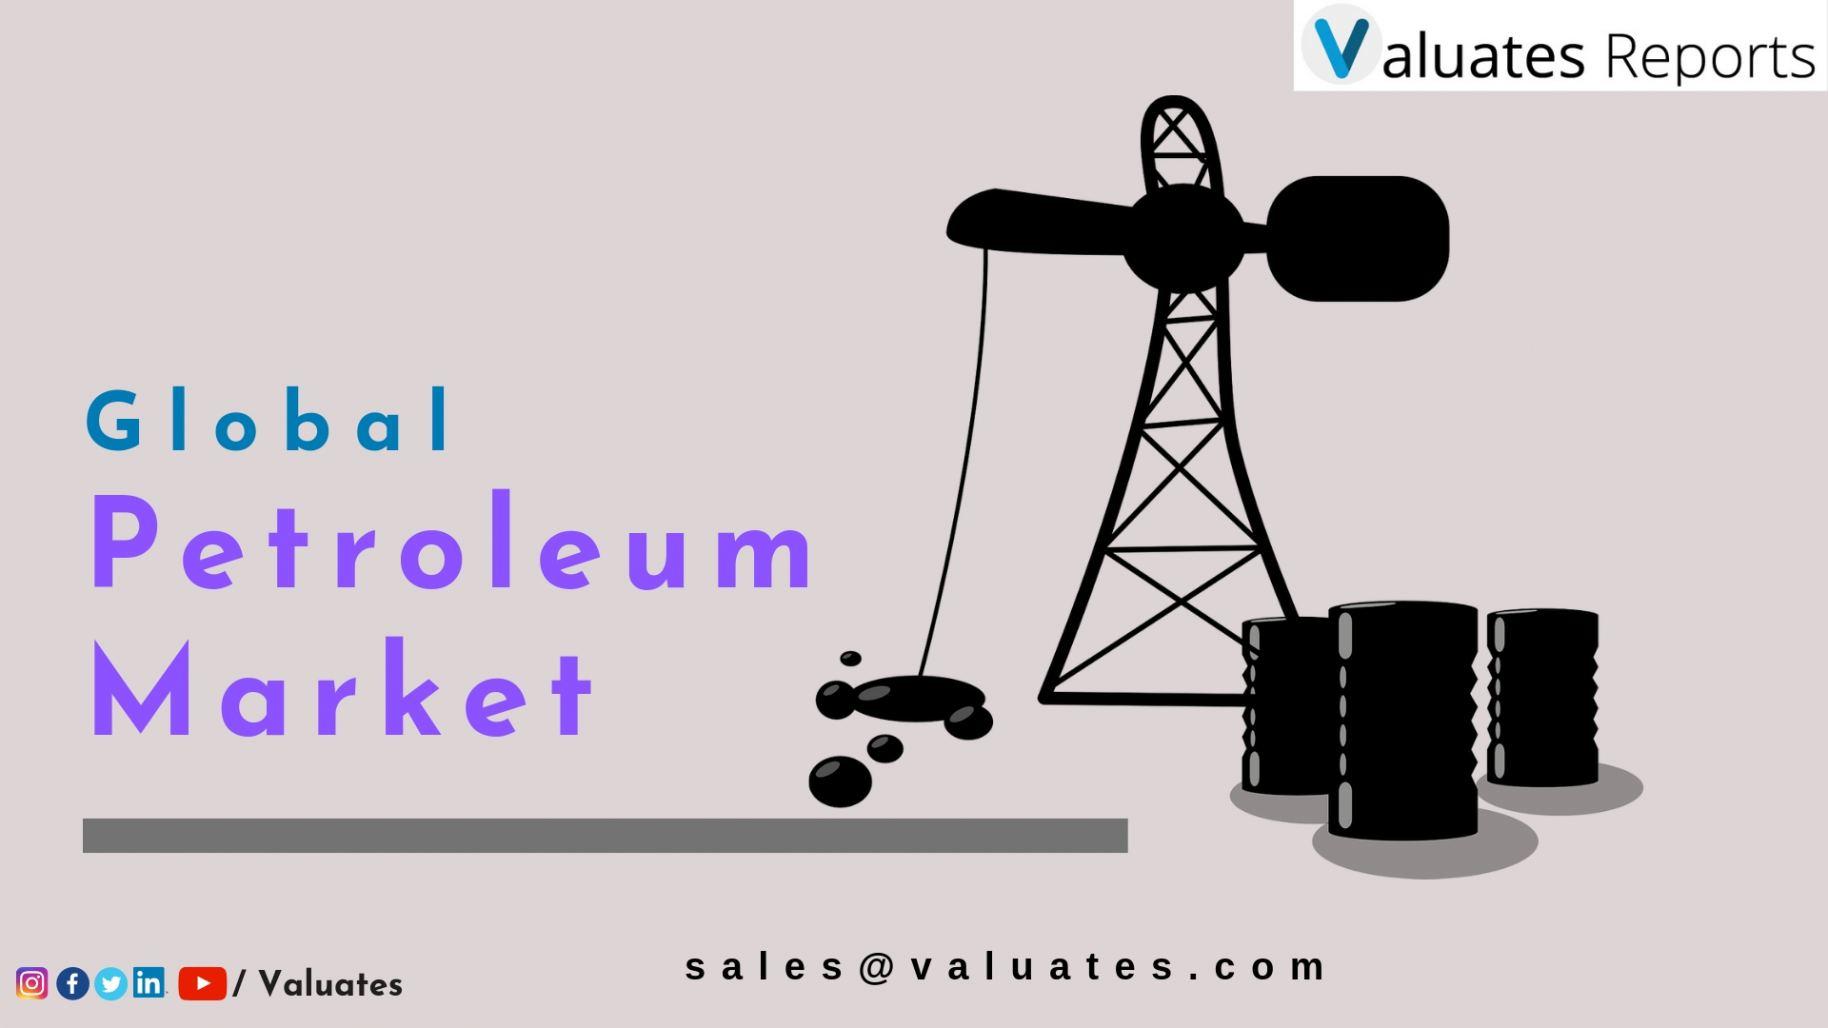 Petroleum market_valuatesreports